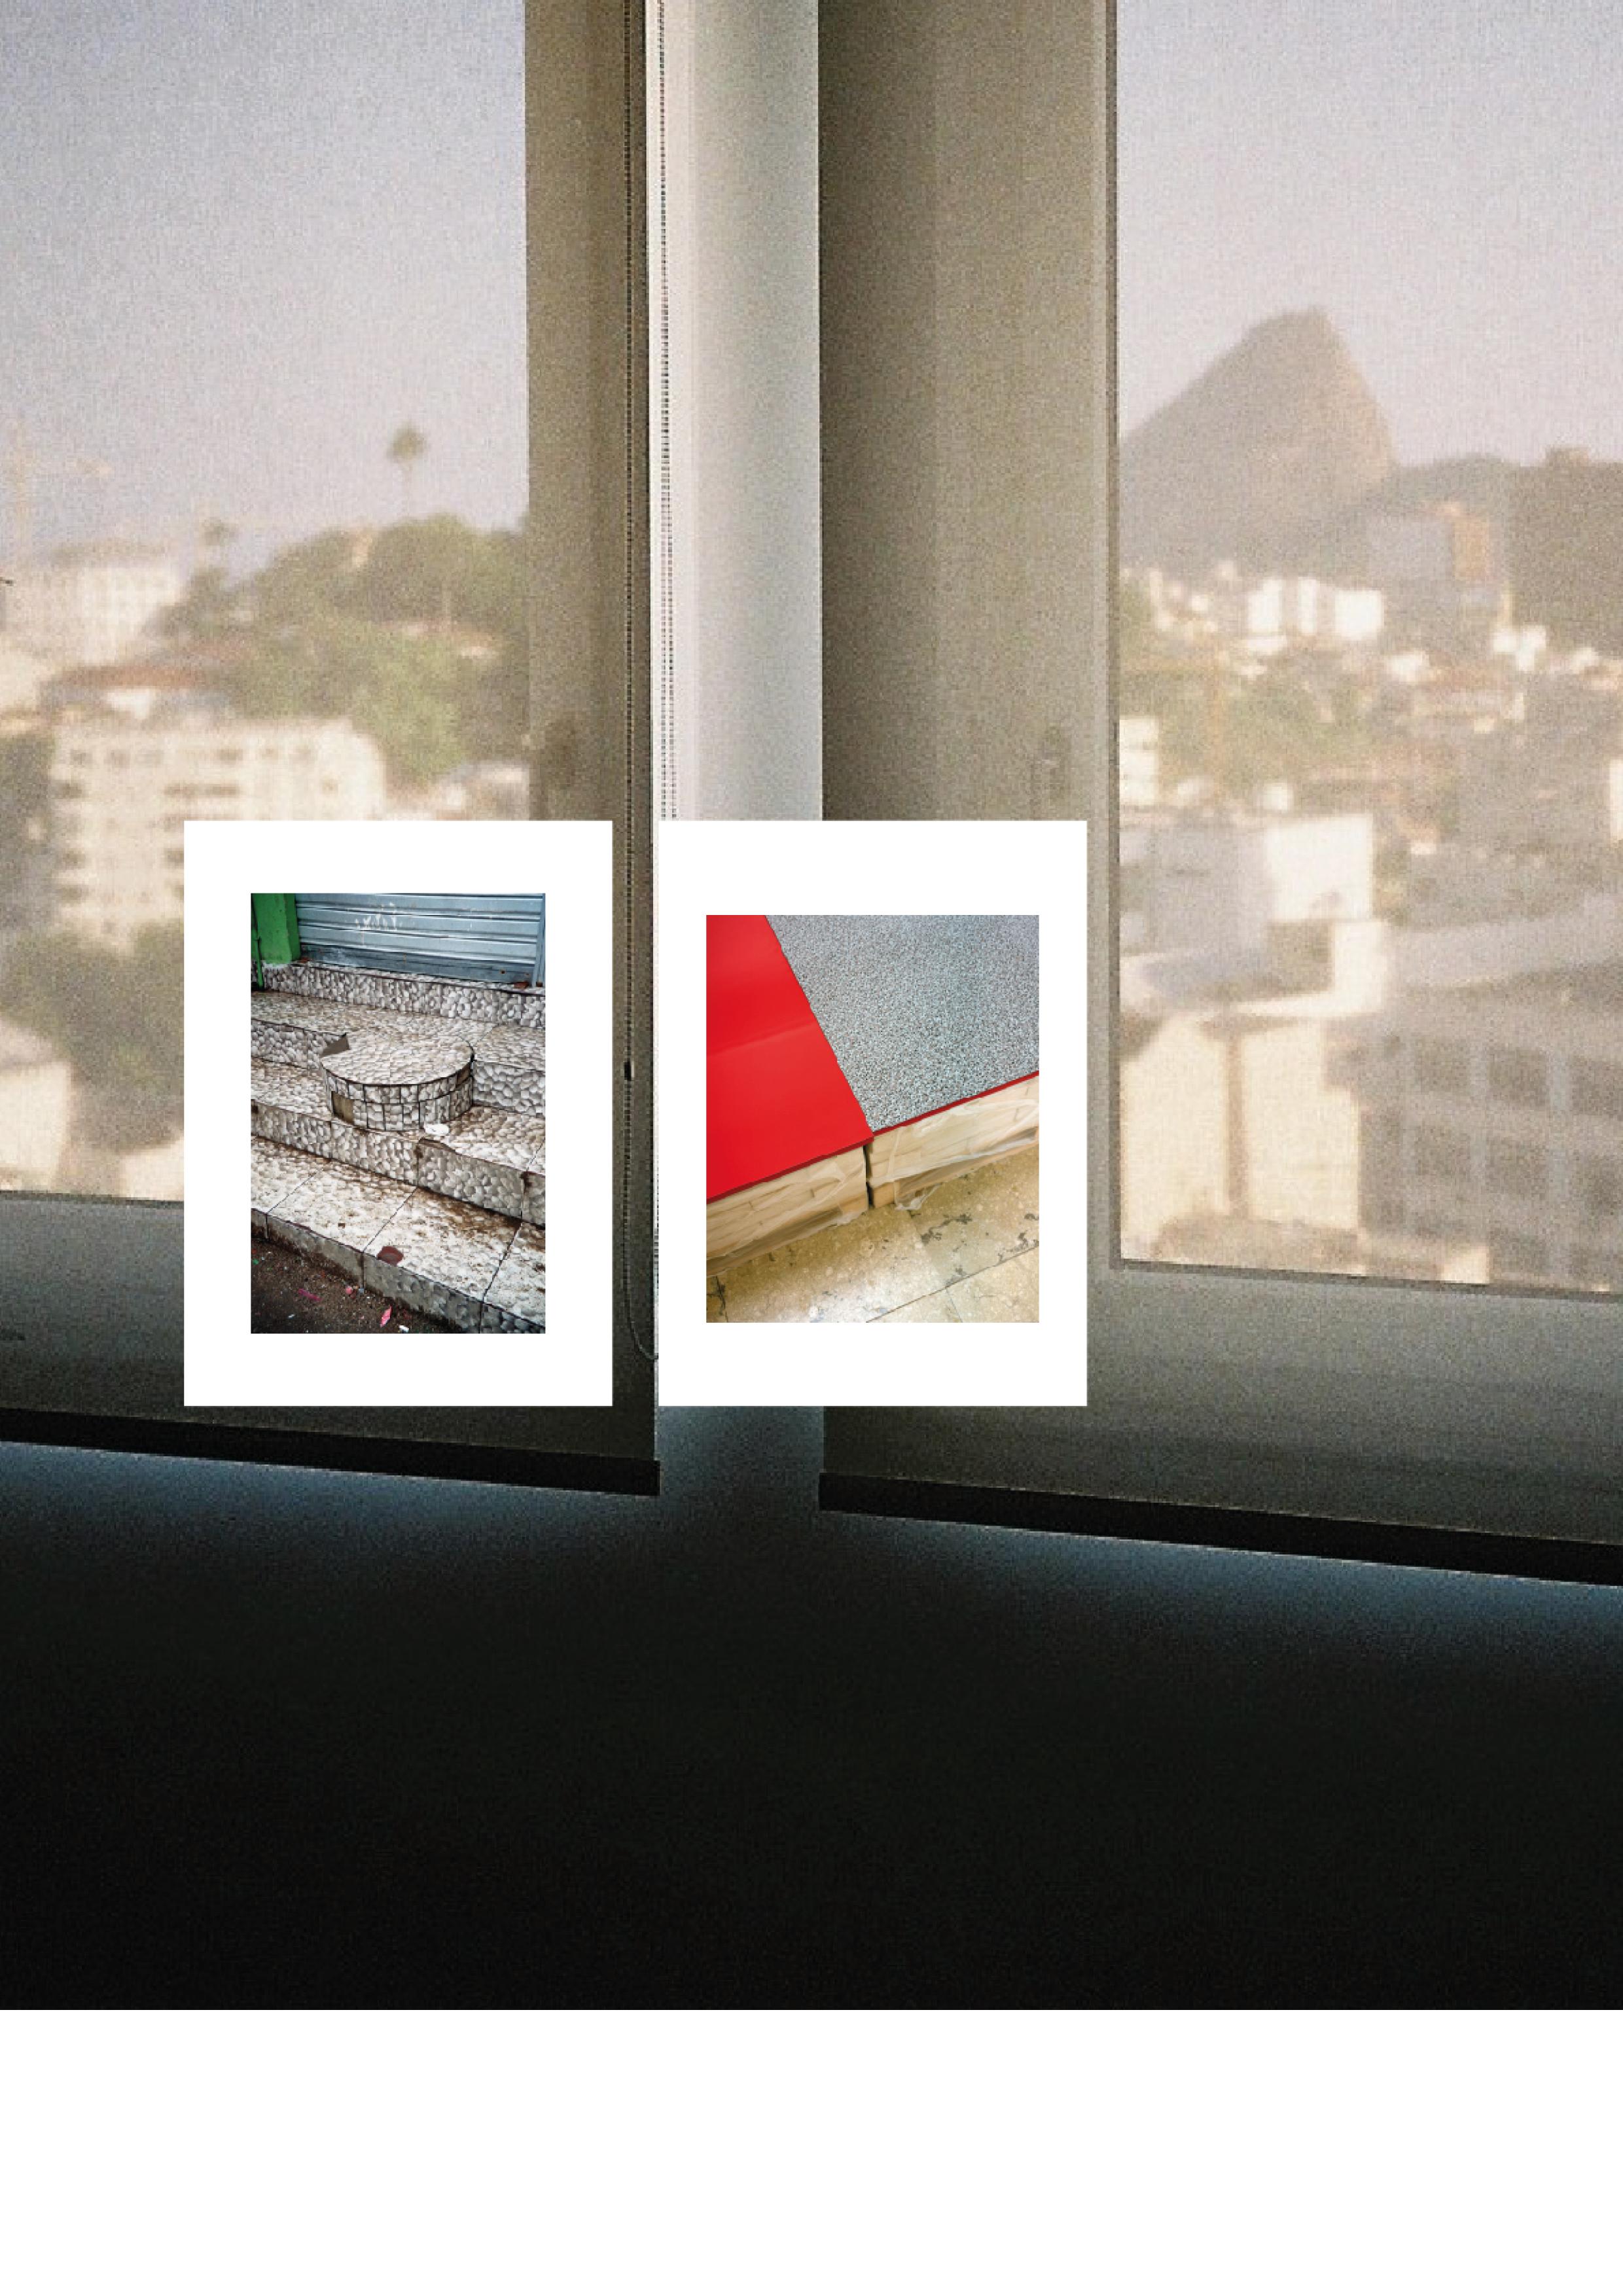 SomethingFantastic_Zara_Pfeifer_DoThings_Press_Images_1